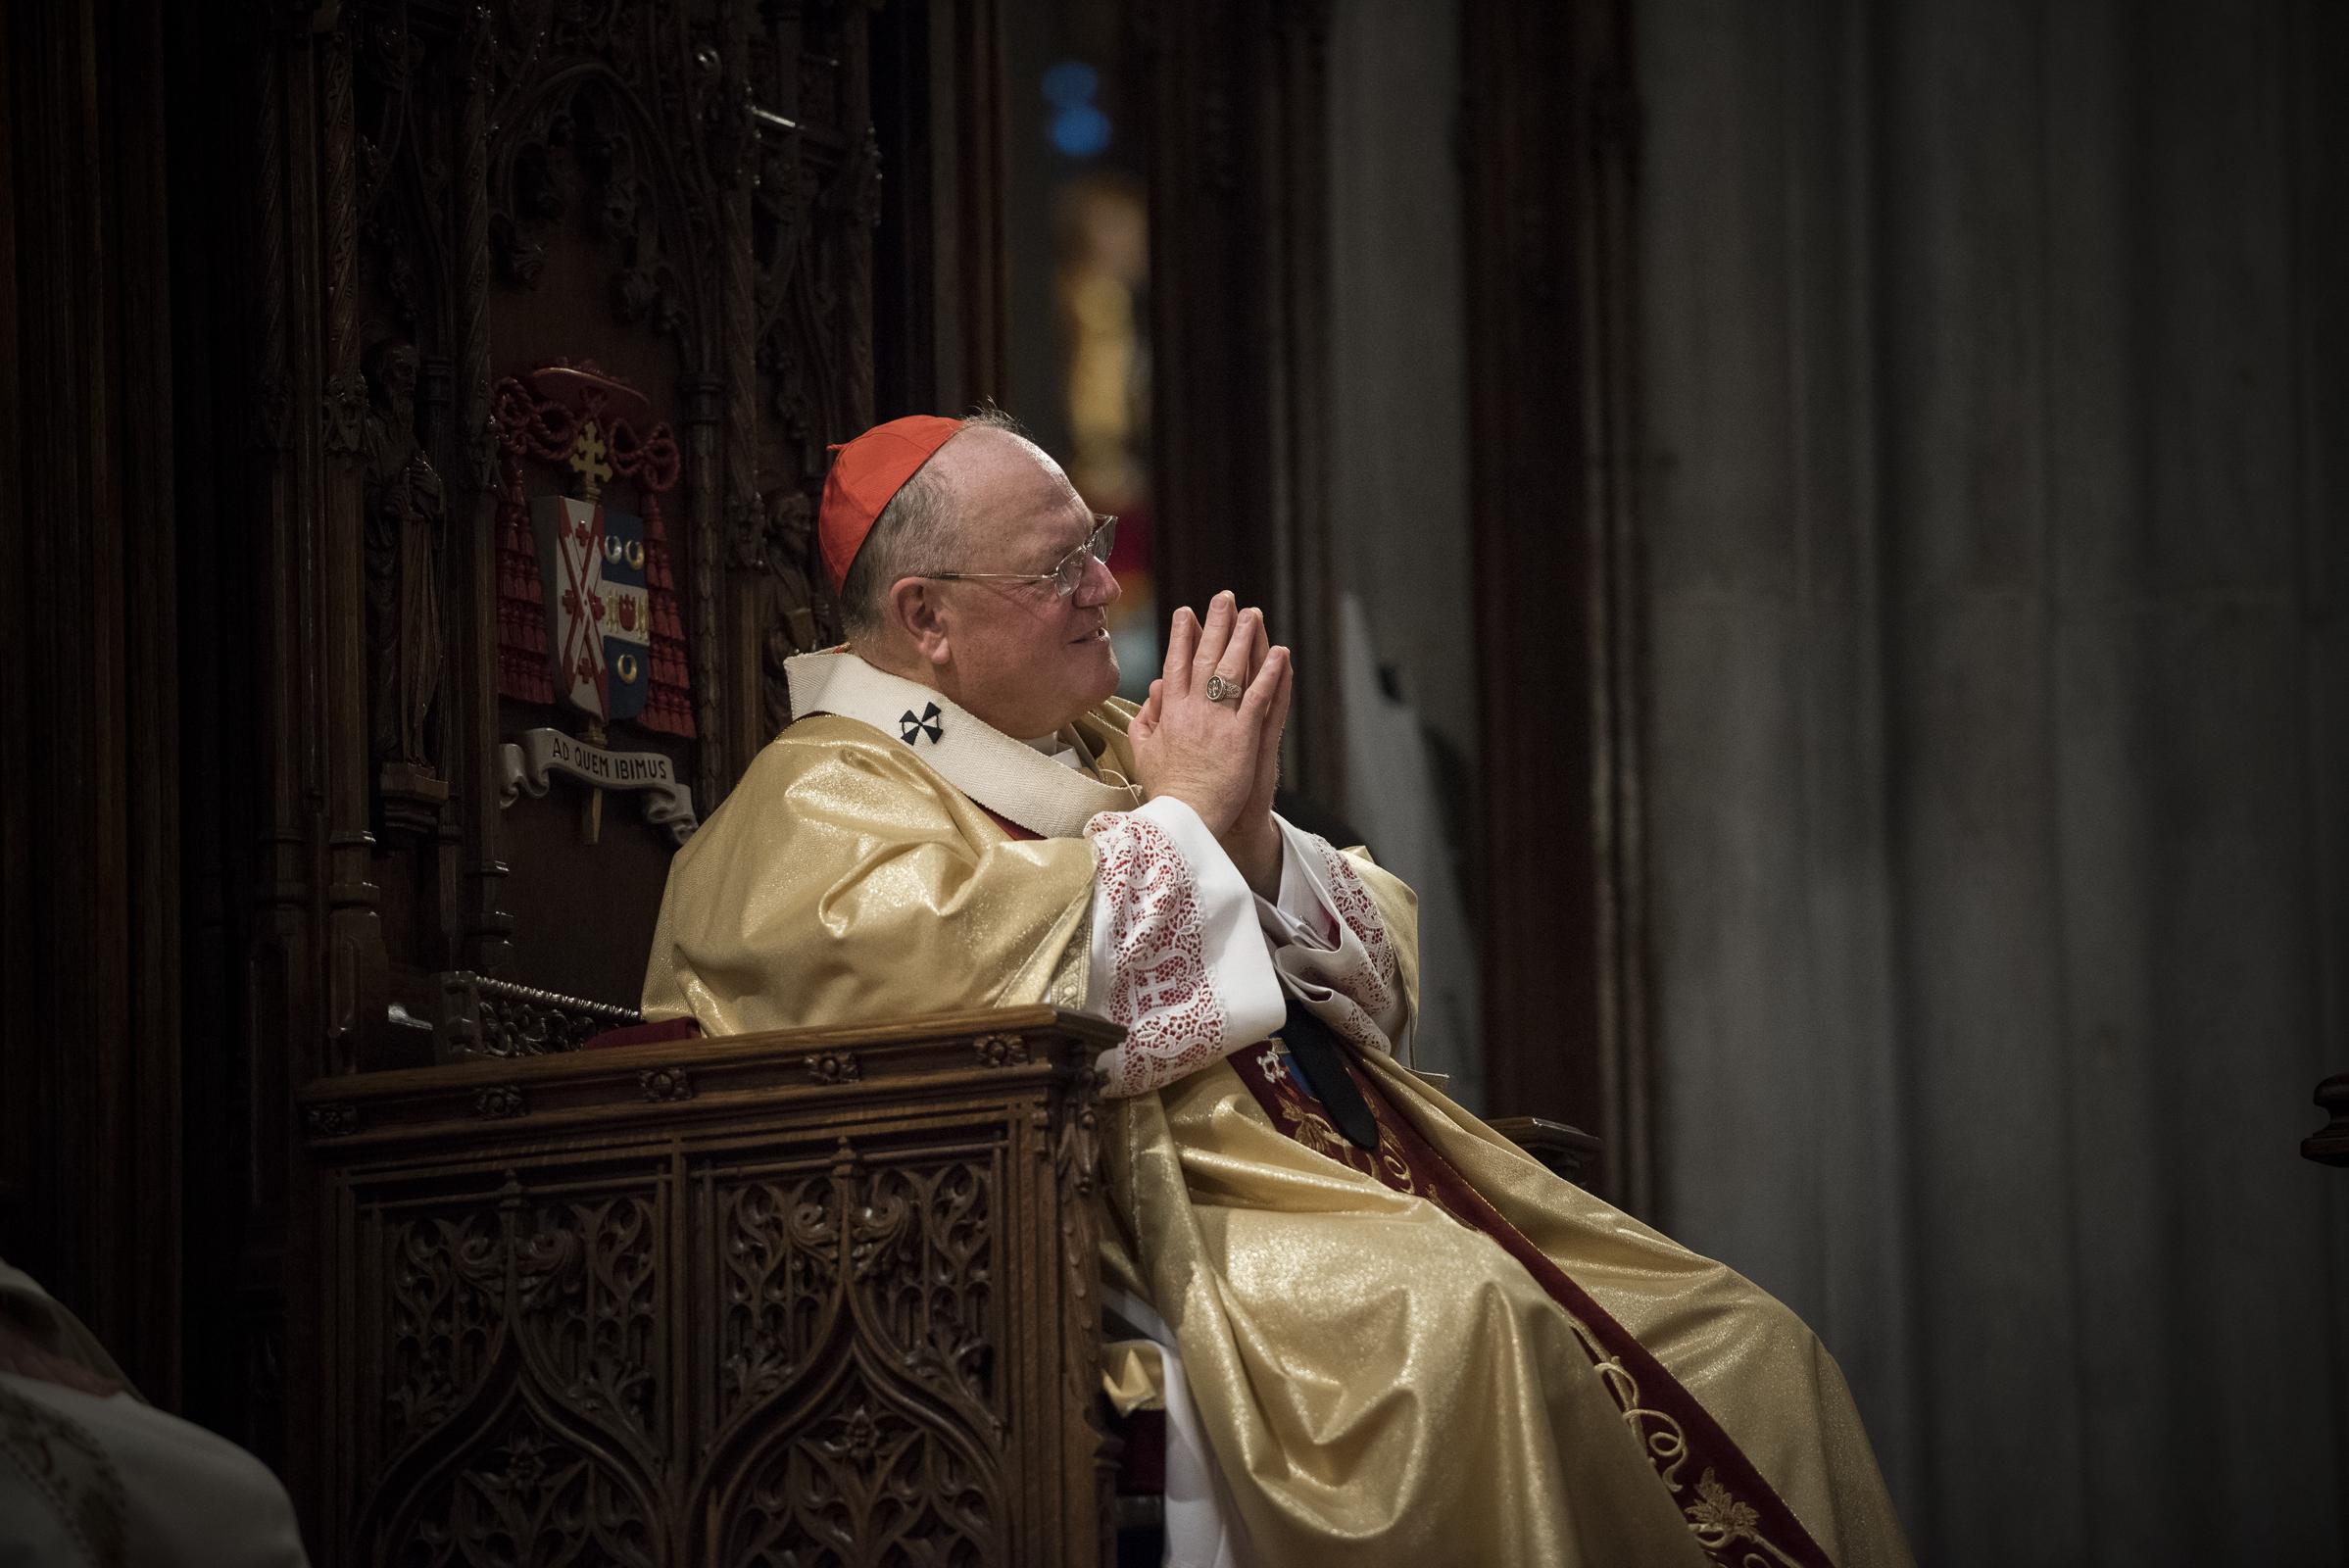 Timothy Cardinal Dolan, Archbishop of New York, presided at the ordination.